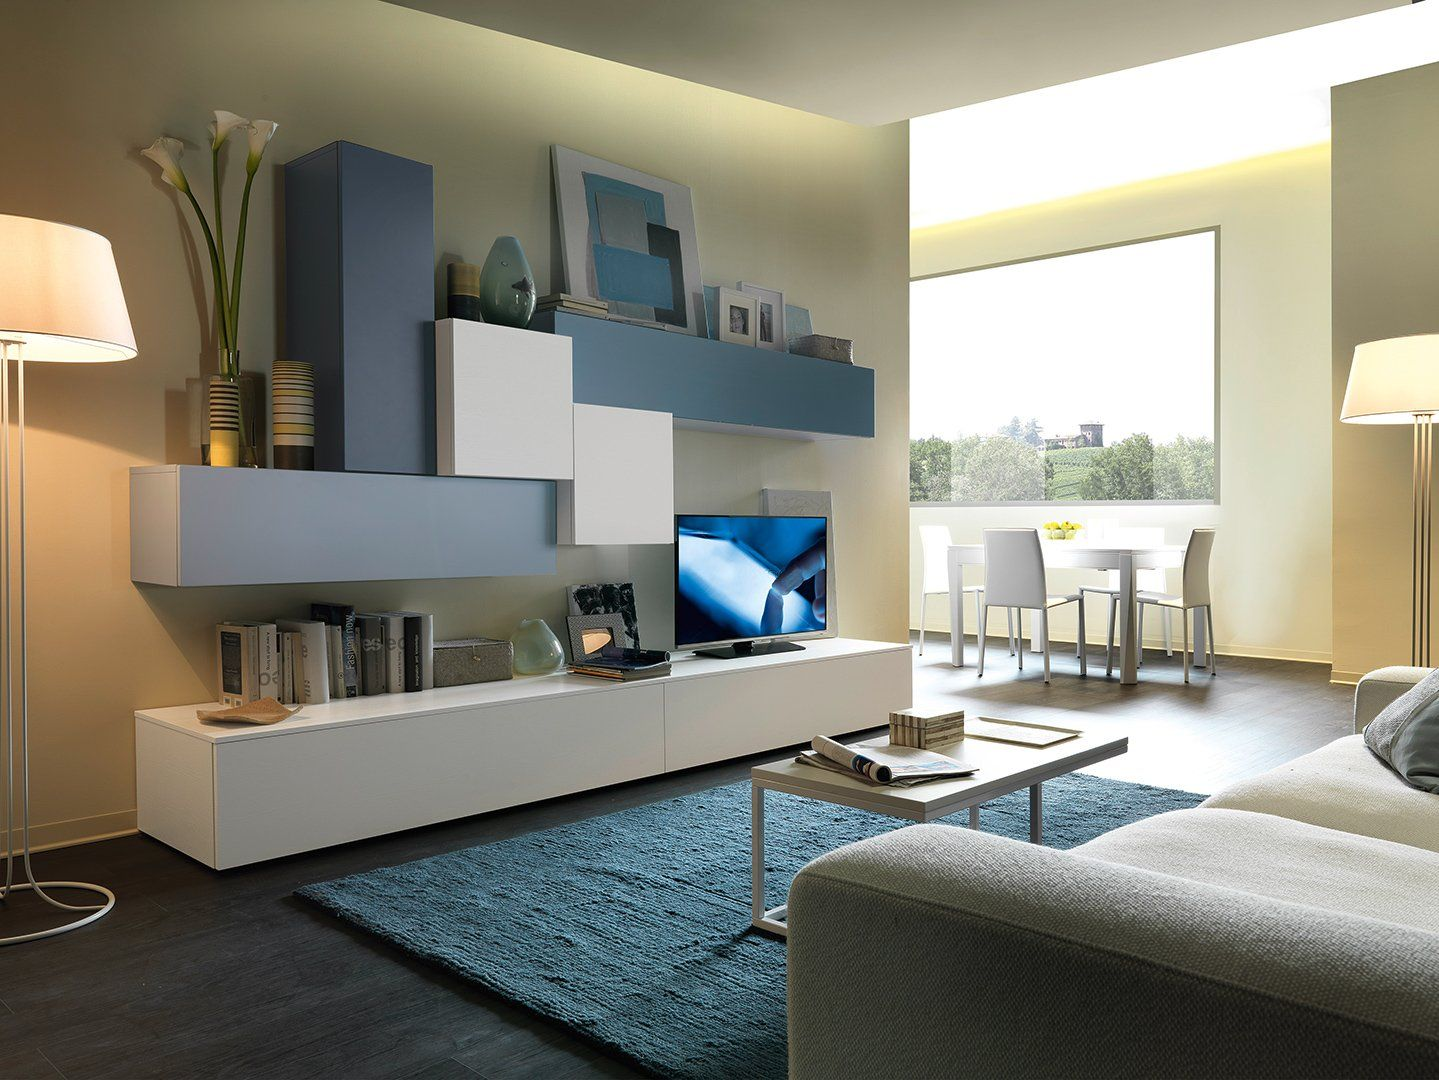 Mobili soggiorno modello shavit chateau d 39 ax sala nel for Mobili sala da pranzo moderni